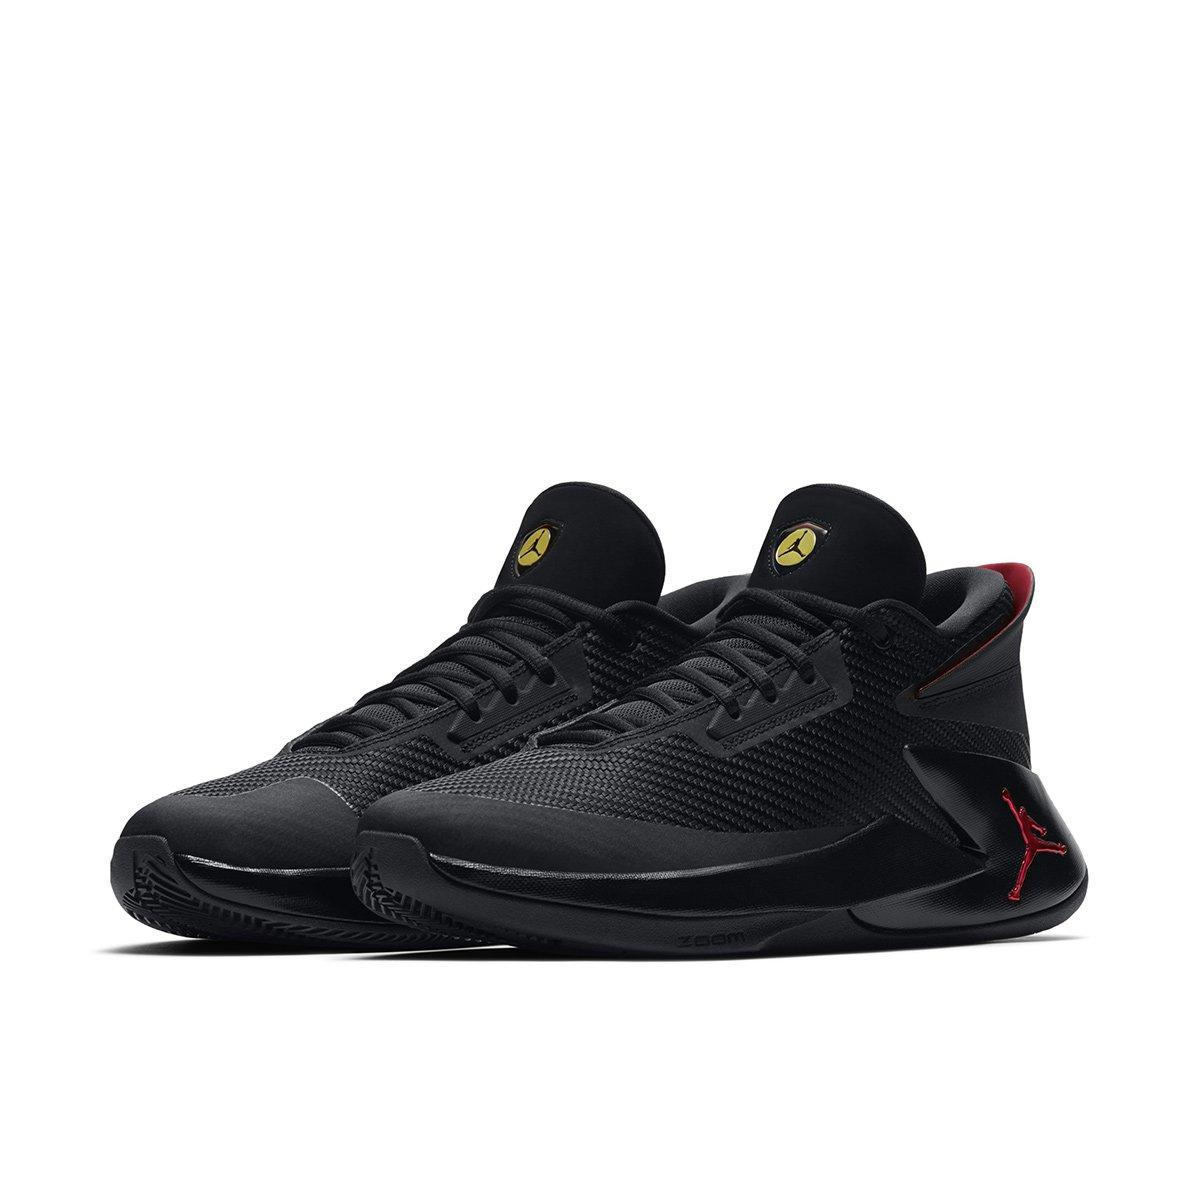 8cf79c9abfc Tênis Couro Nike Jordan Fly Lockdown Masculino - Compre Agora